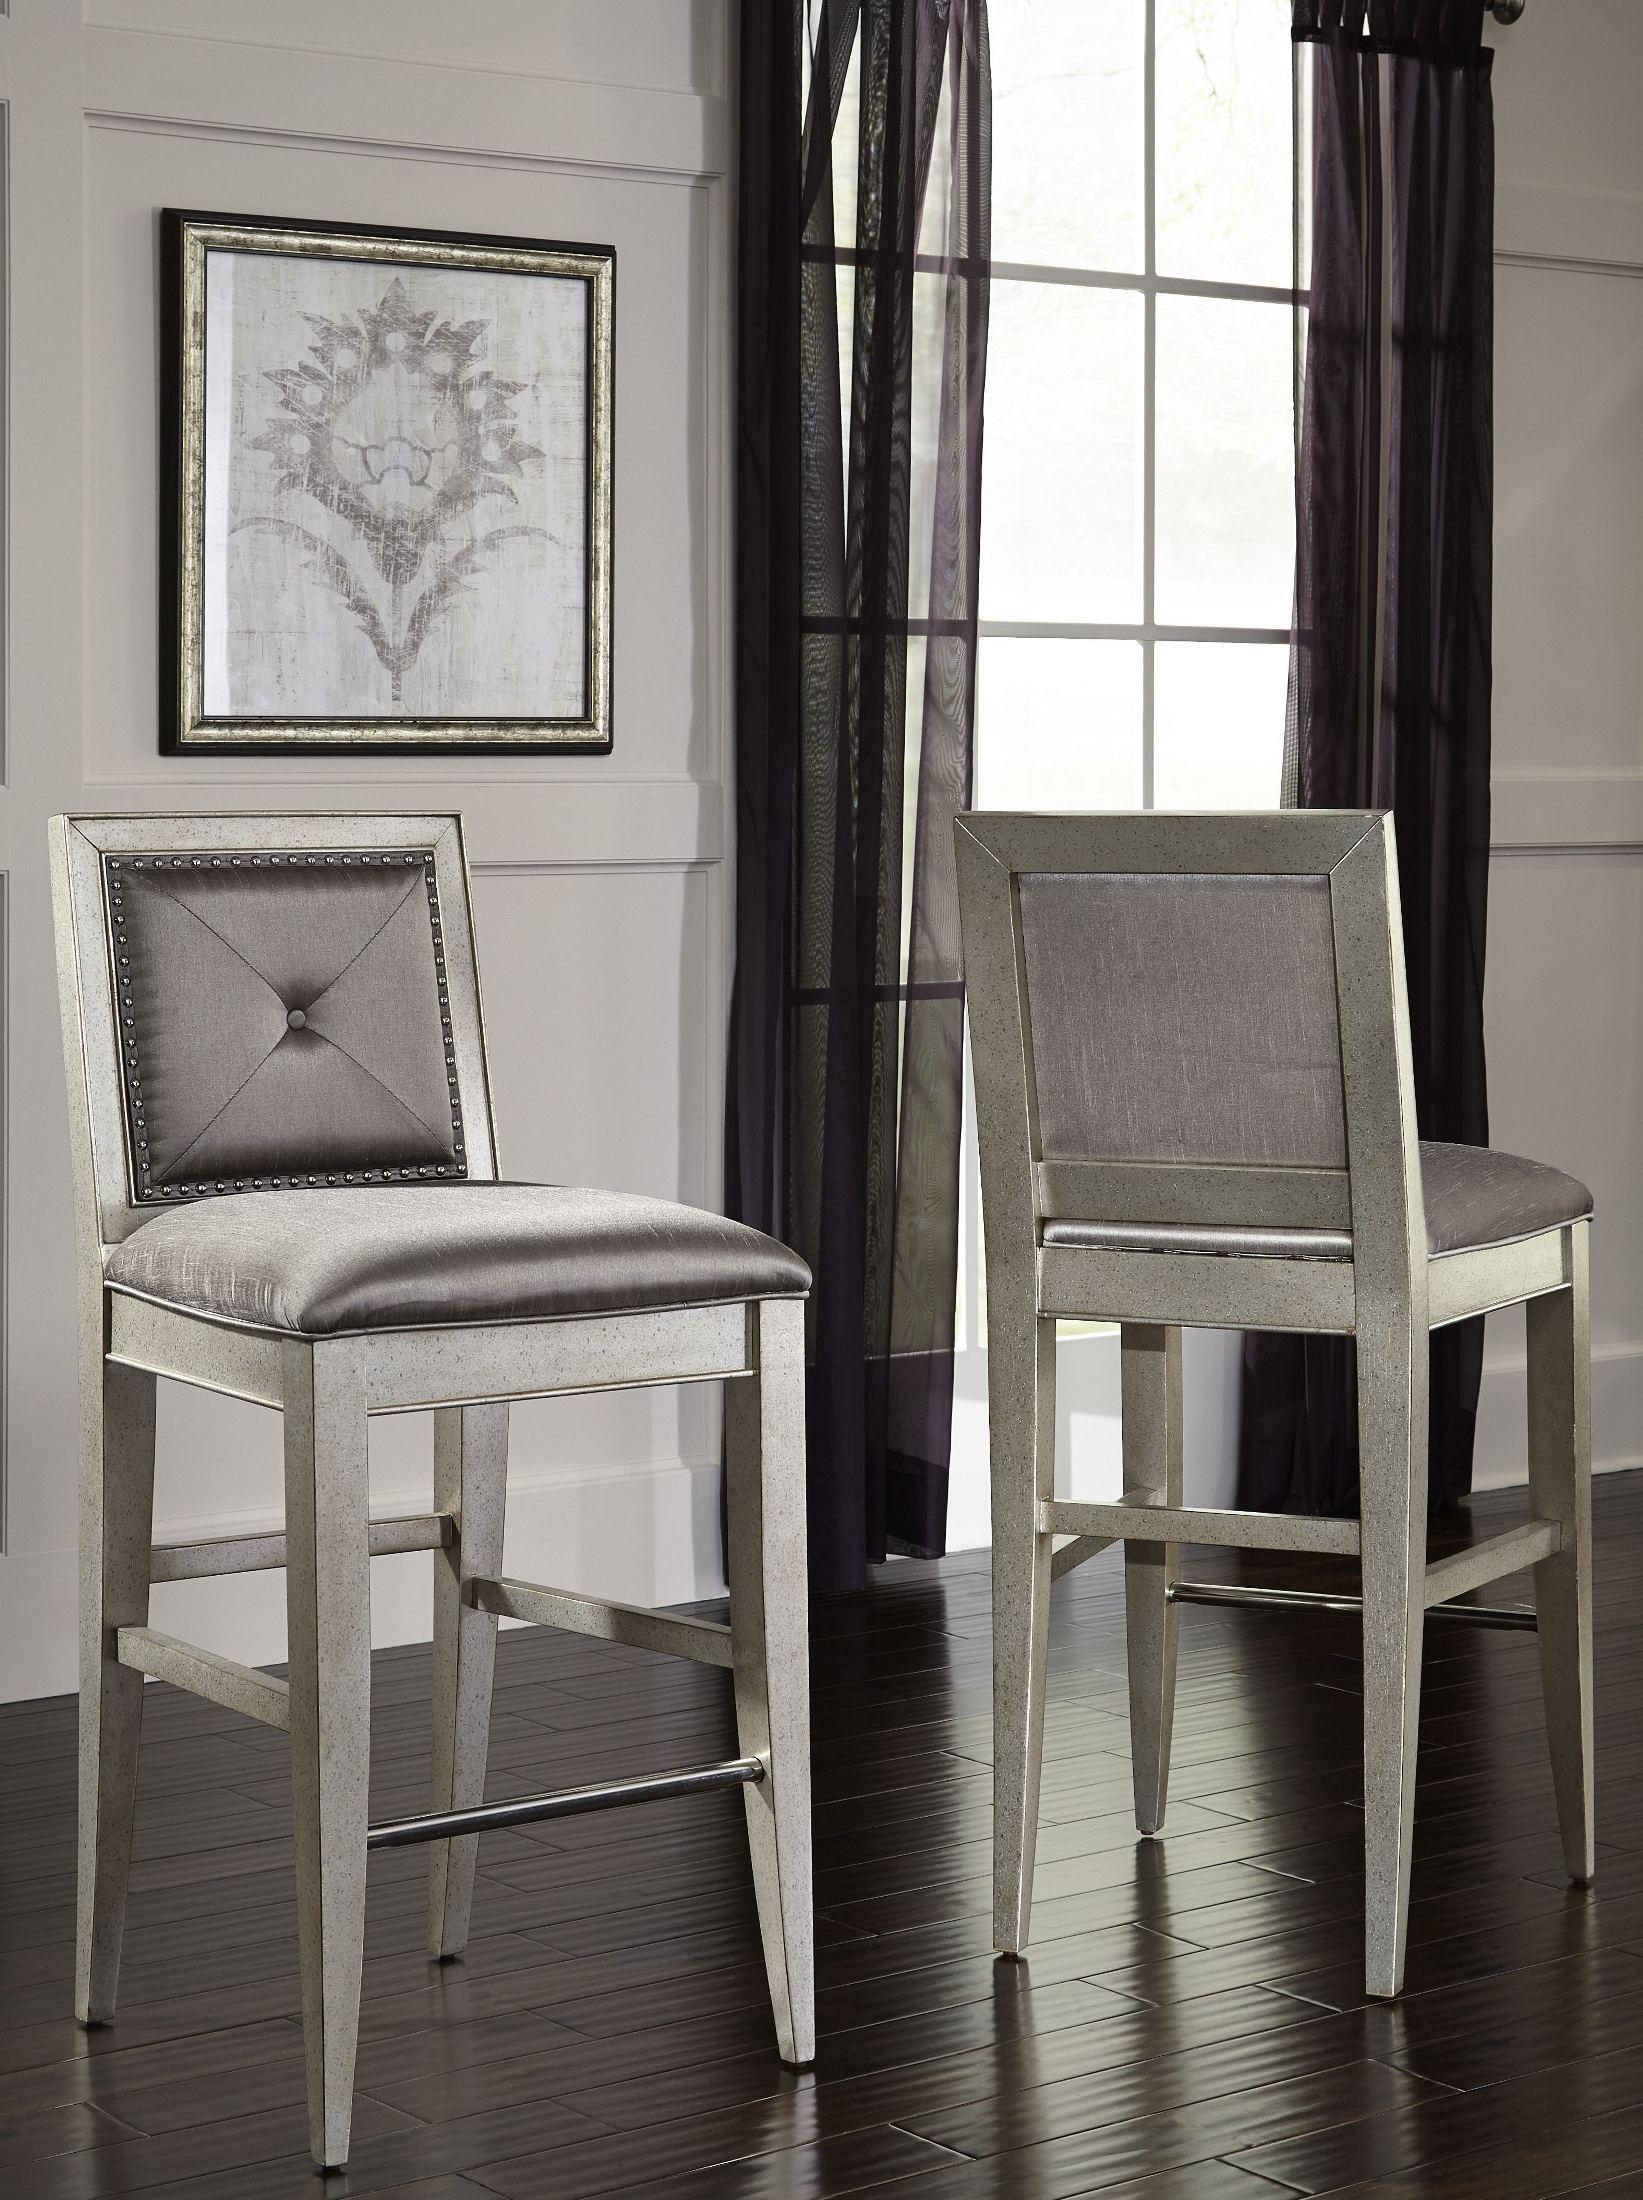 Farrah Silver Bar Stool From Pulaski Coleman Furniture